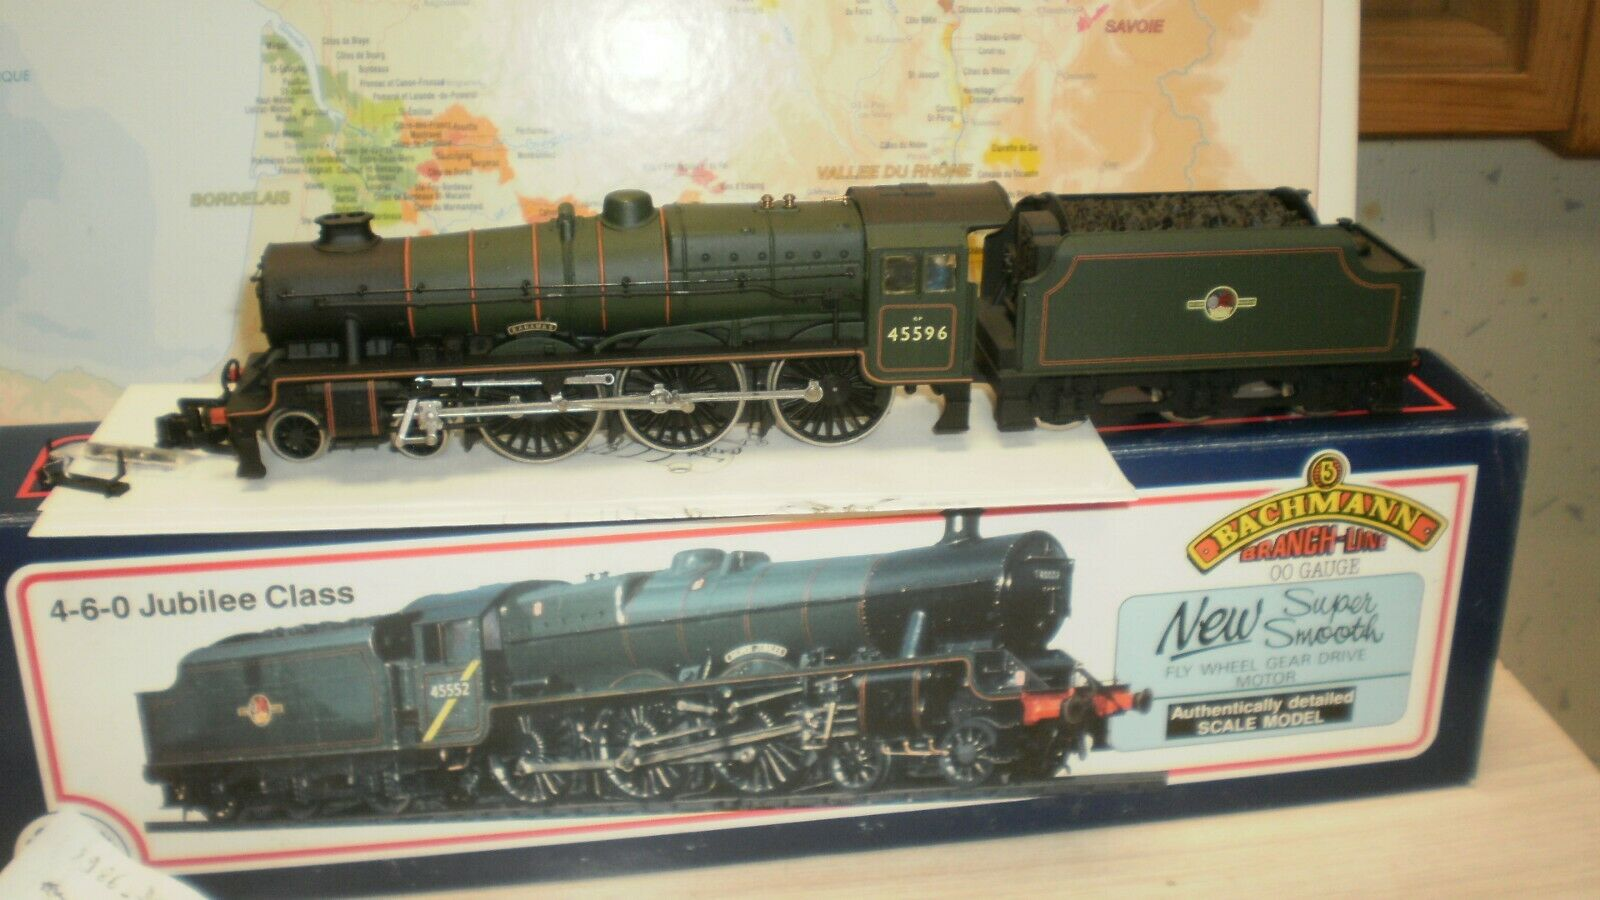 Loco vapeur Jubilee classe  Bahamas  GP 45596 BR Bachuomo voie HO 2 rails